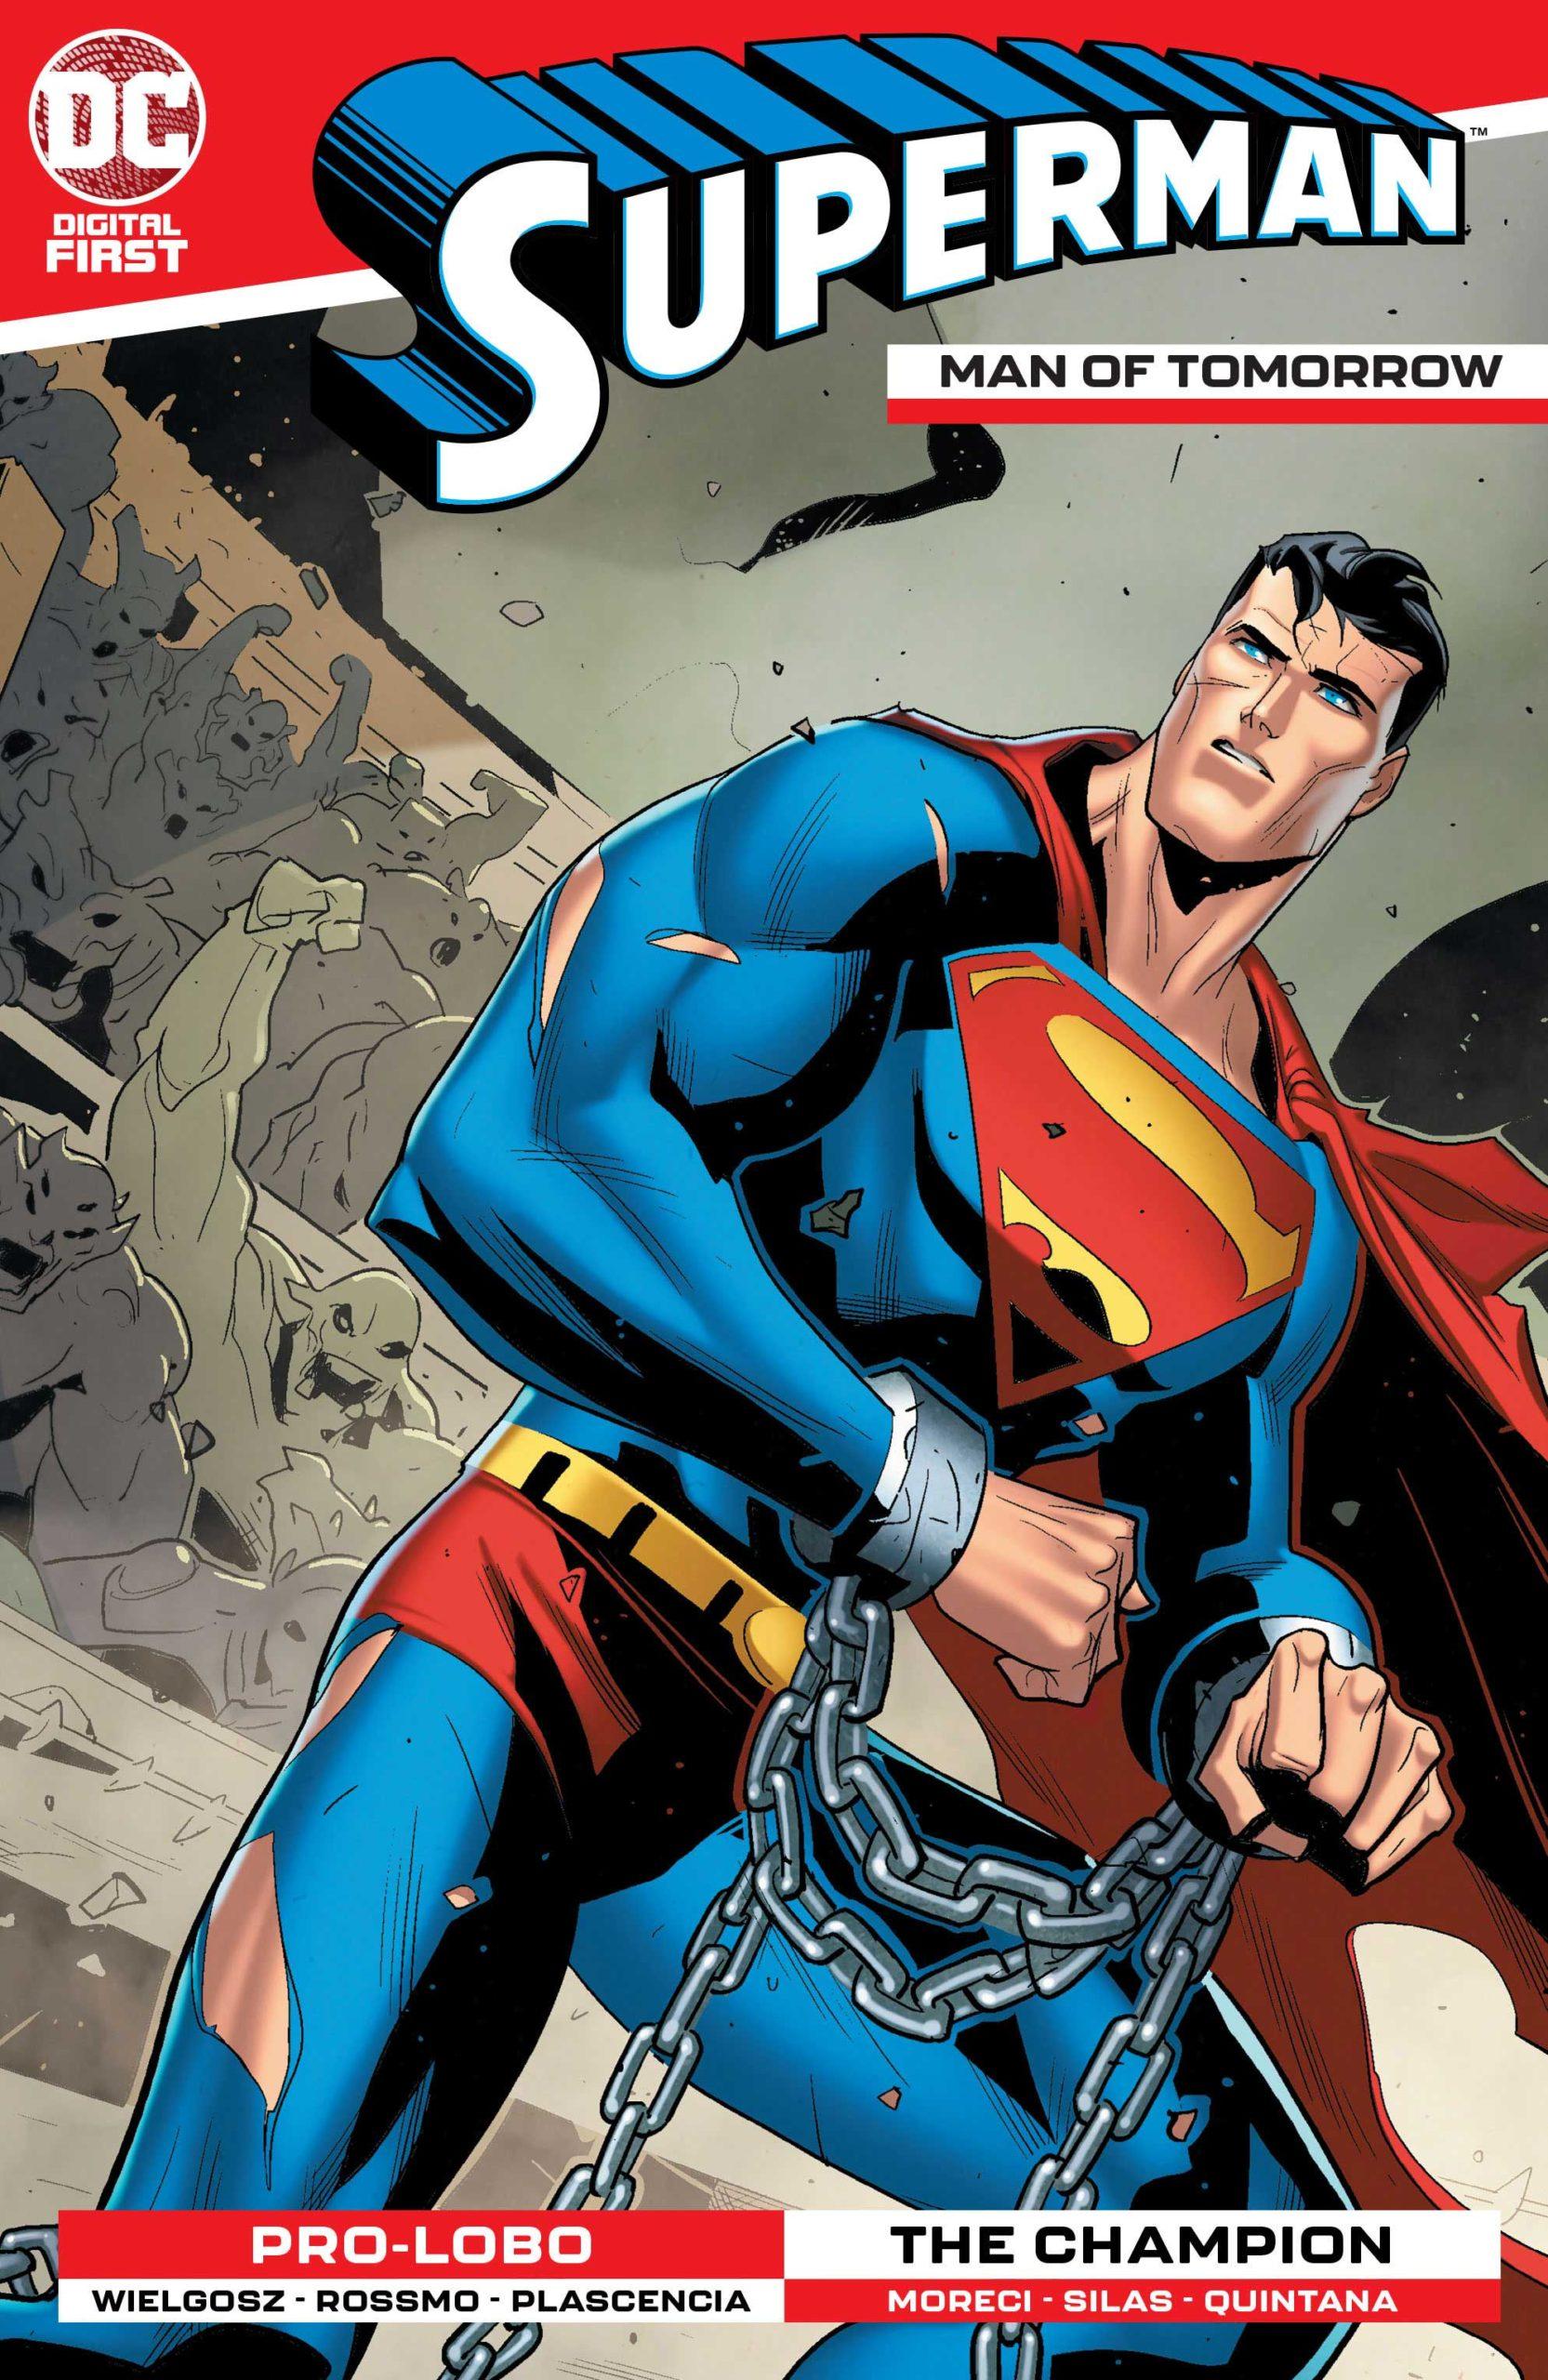 Superman: The Man of Tomorrow #10